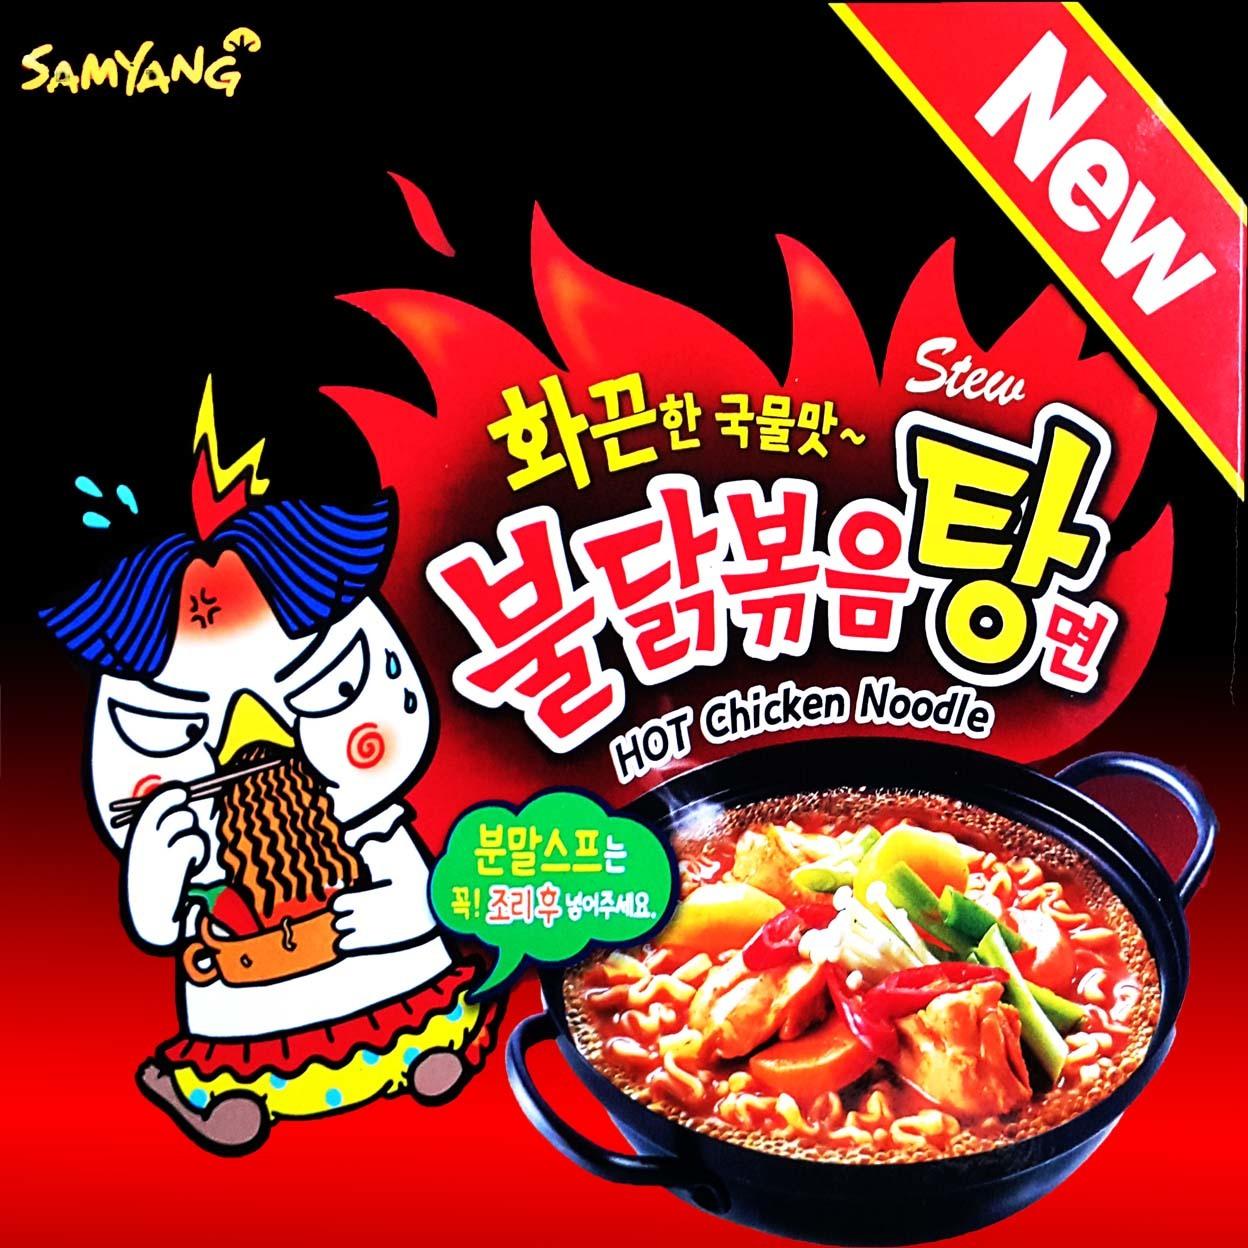 Http List Item Ramyun Nongshim Small Shin Paldo Bowl Noodle Shrimp Flavor 86 Gram 820170212 01g 0 W St G